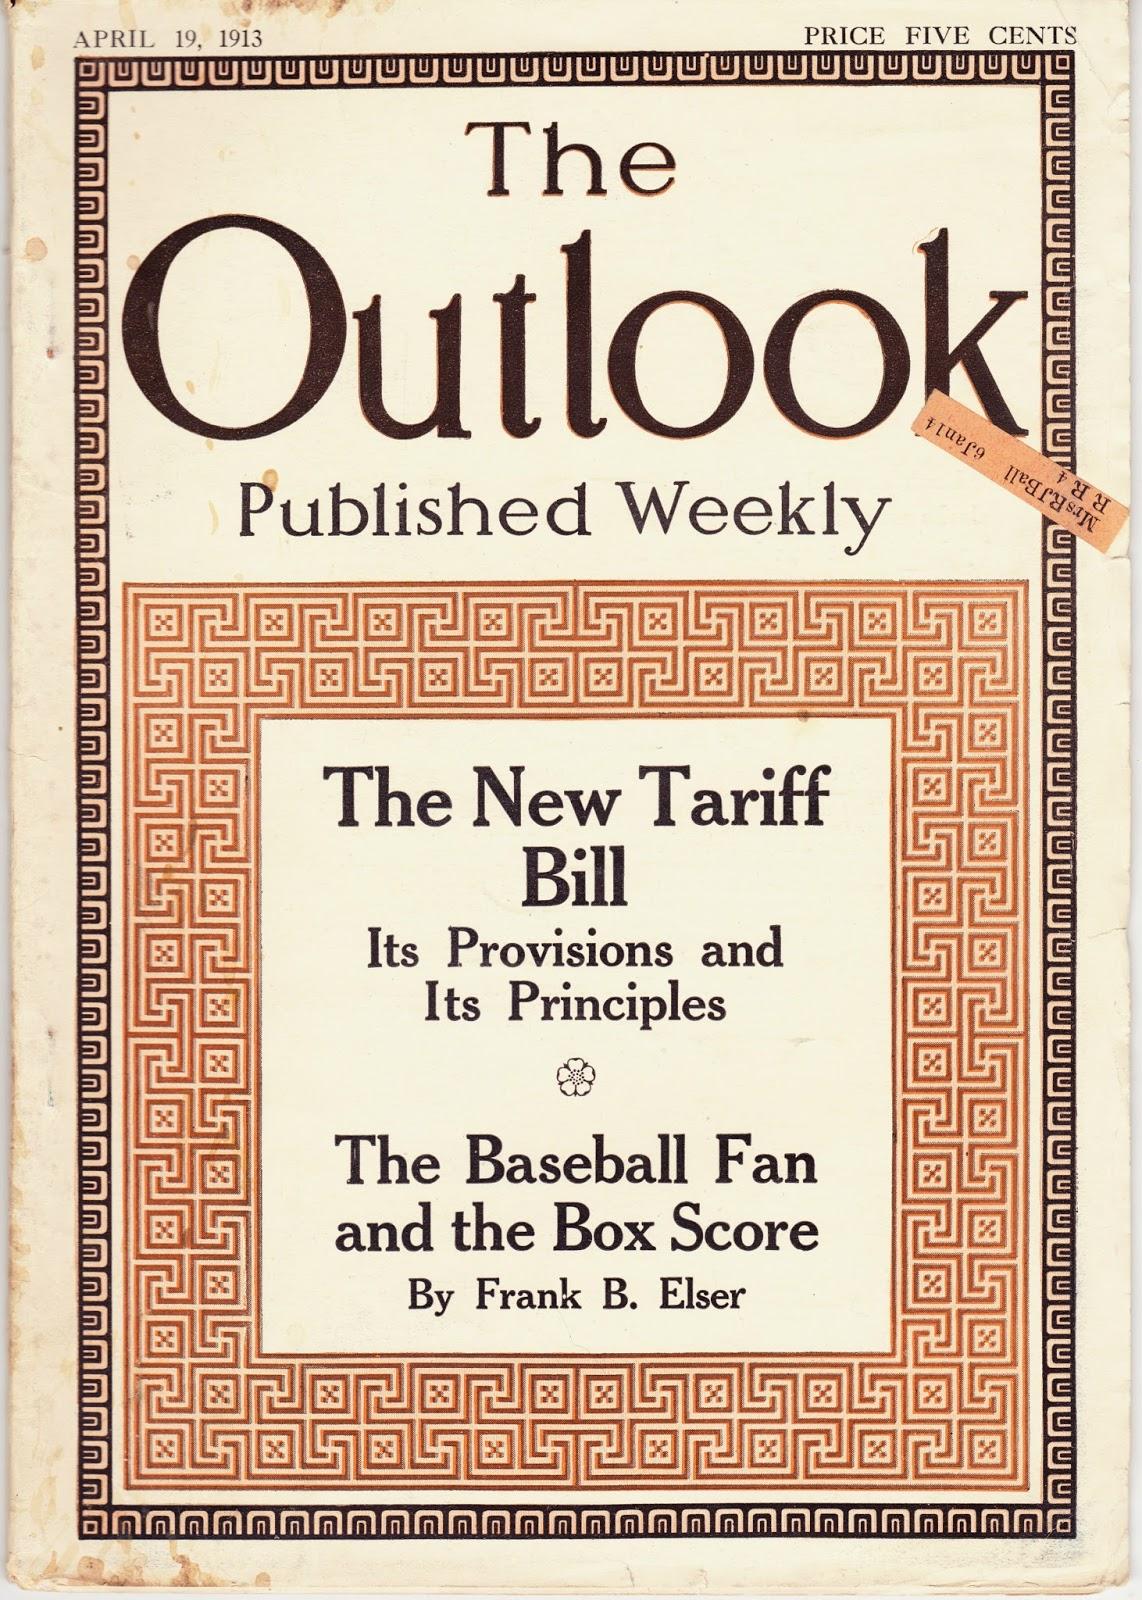 1913 essay on the baseball box score 1913 essay on the baseball box score